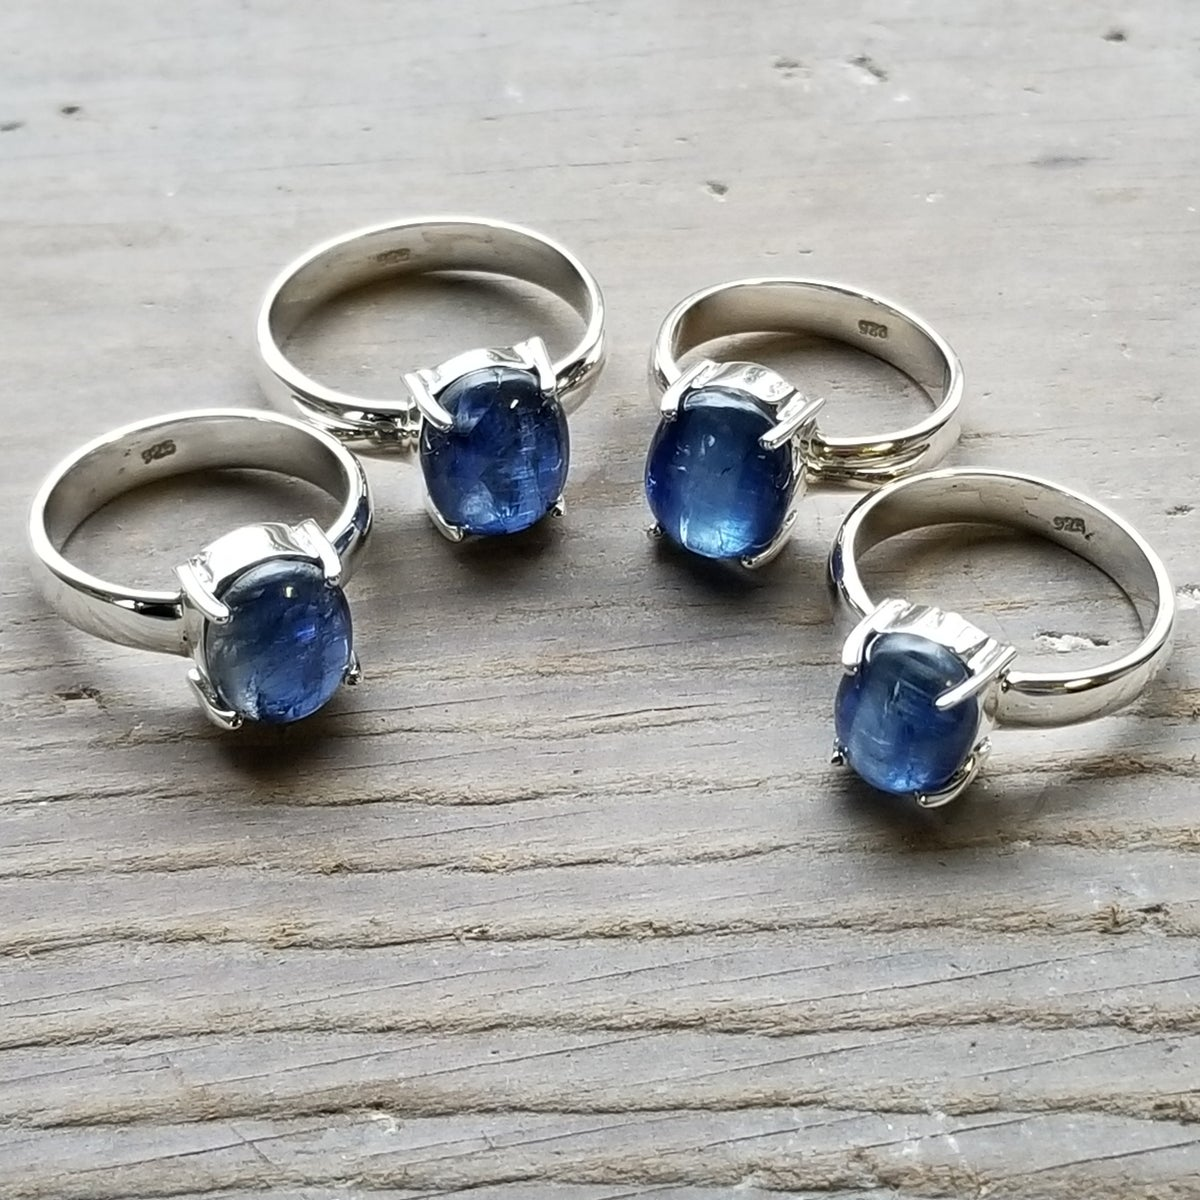 Image of Captive Ring - Blue Kyanite in Sterling